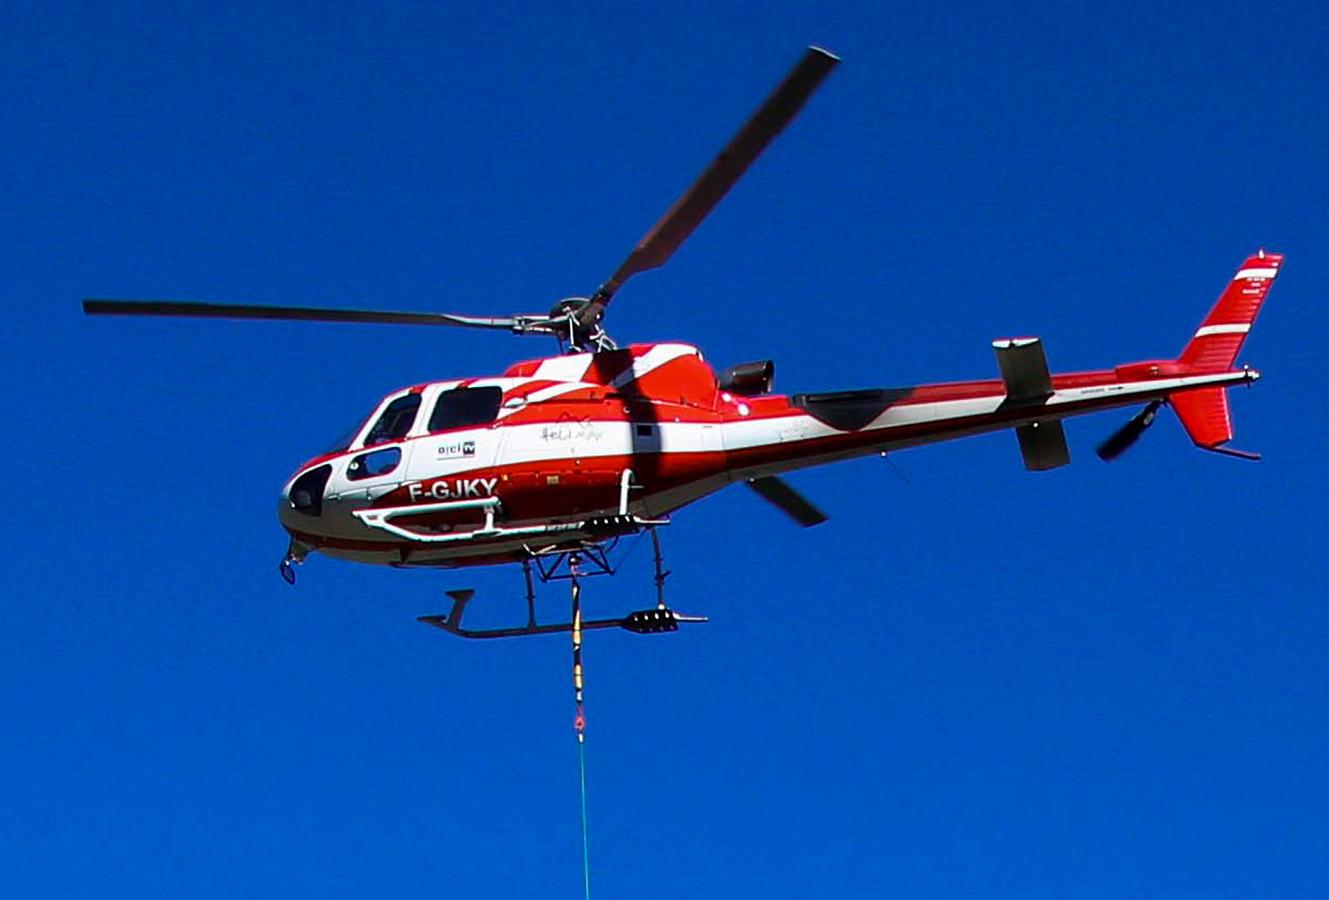 Foto ter illustratie. Een Franse reddingshelikopter.